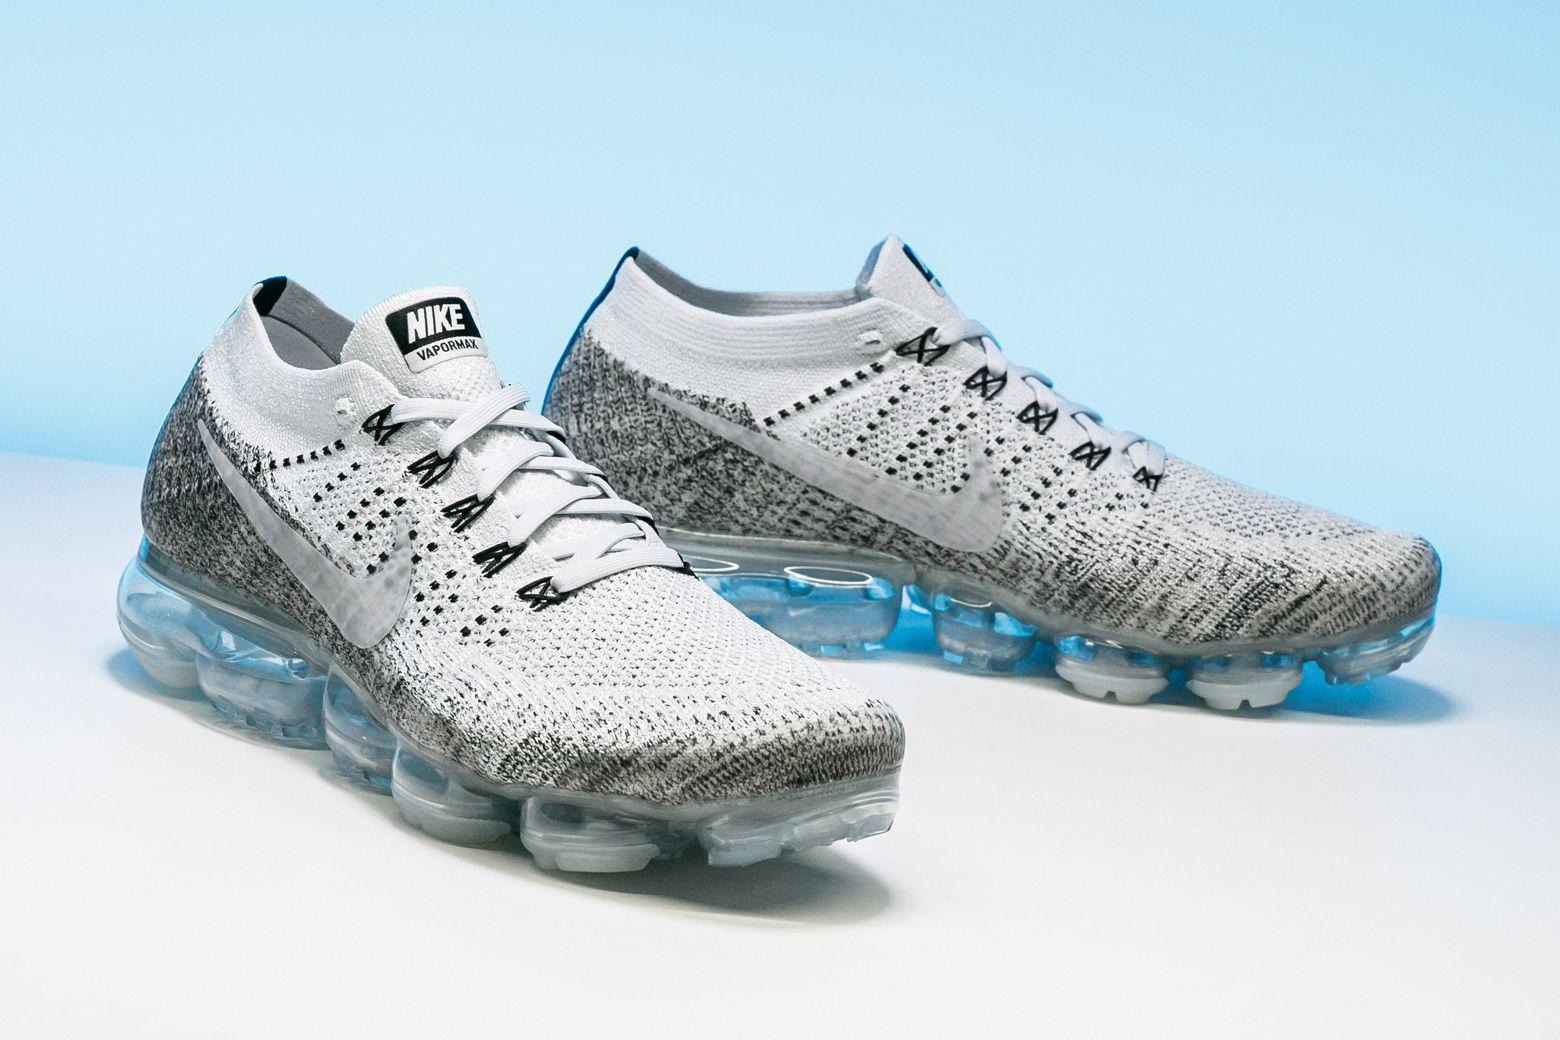 72c3aee6d4b The version of Nike s Air VaporMax sports an